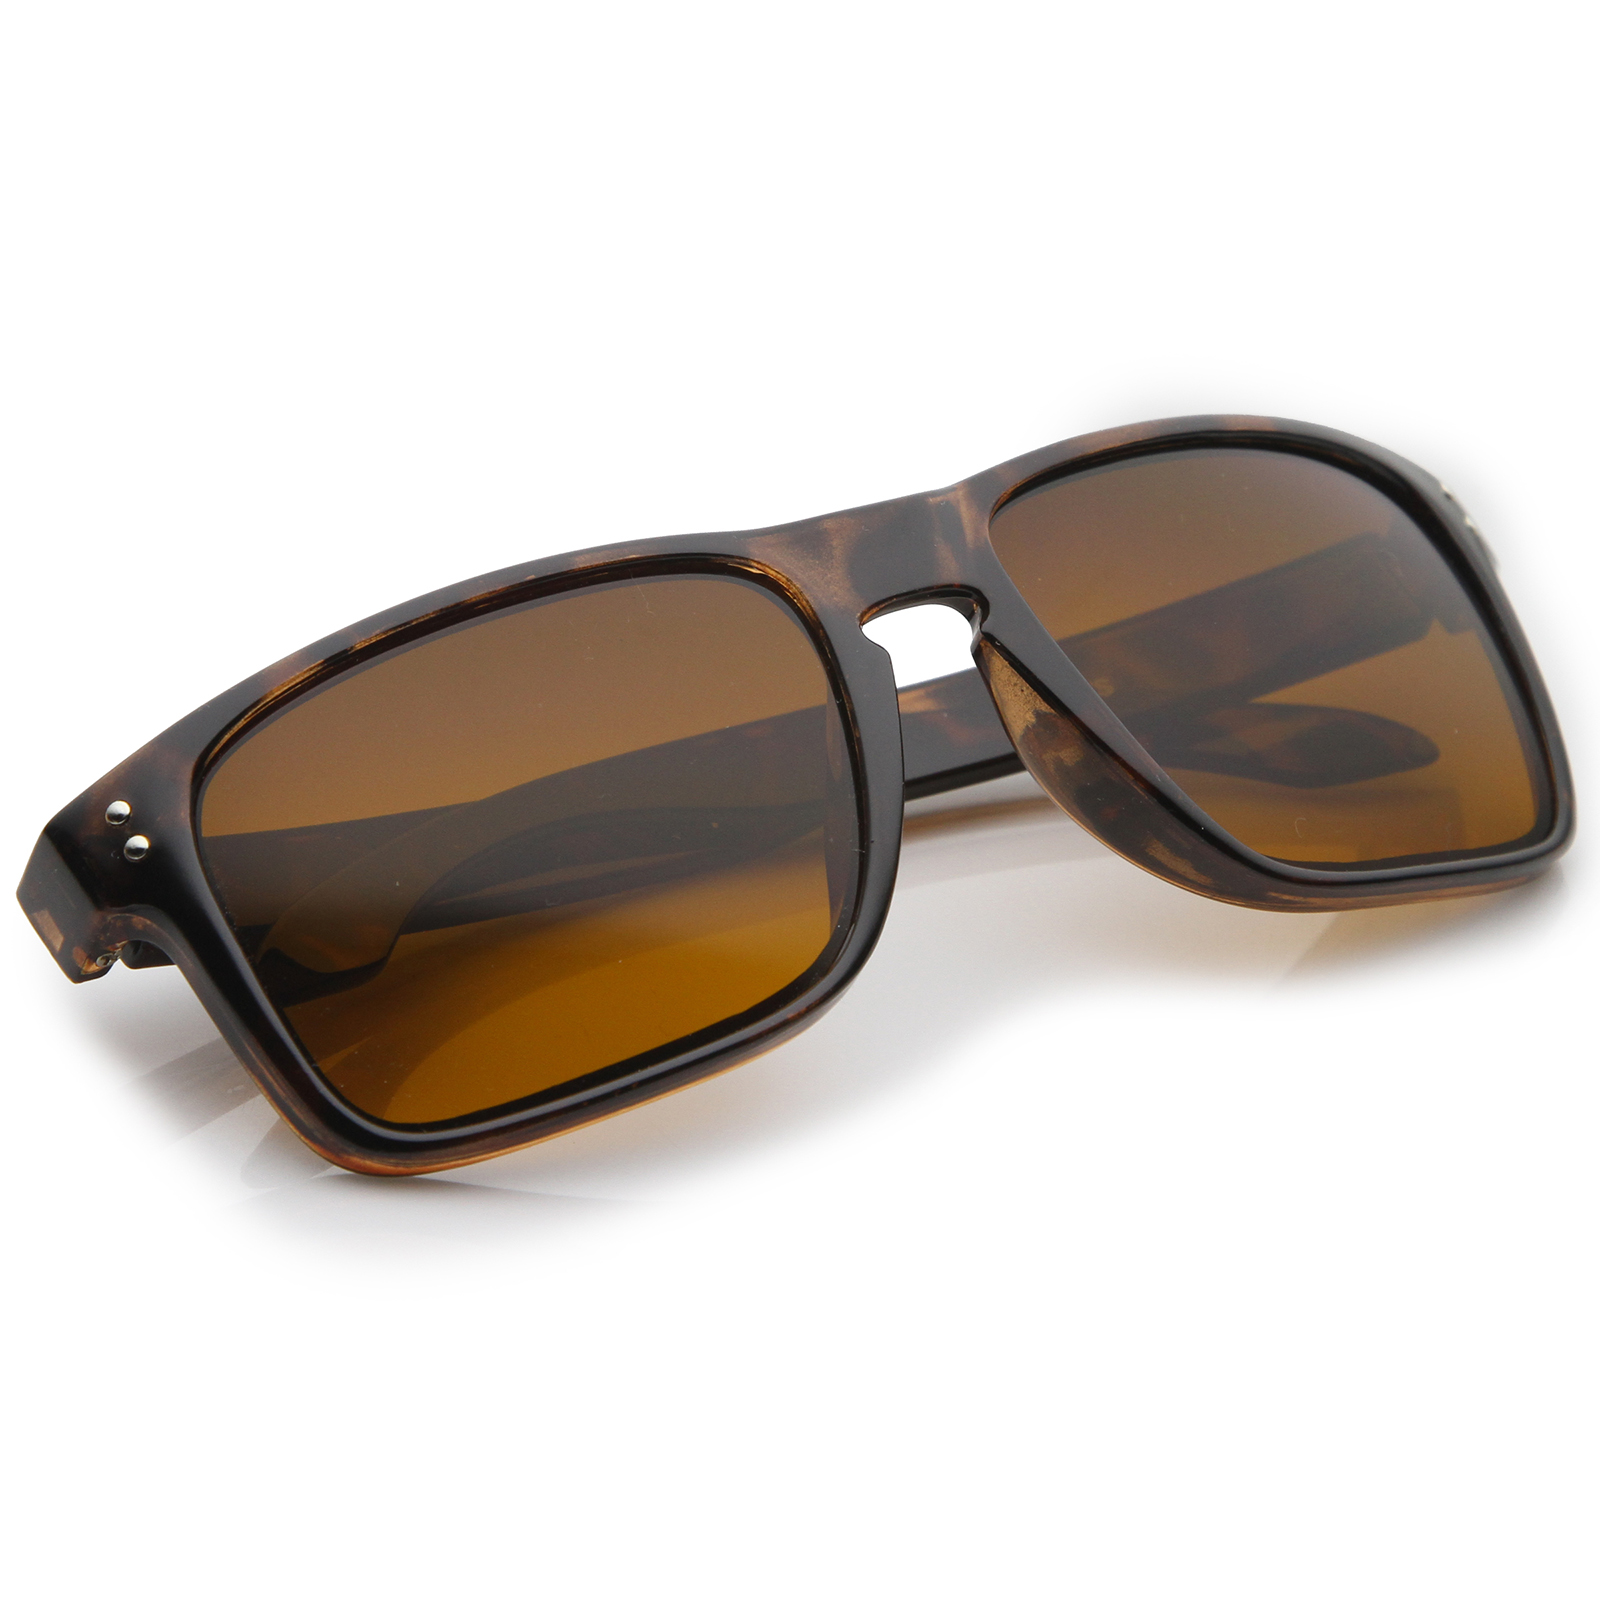 Blue Blocker Sunglasses 19